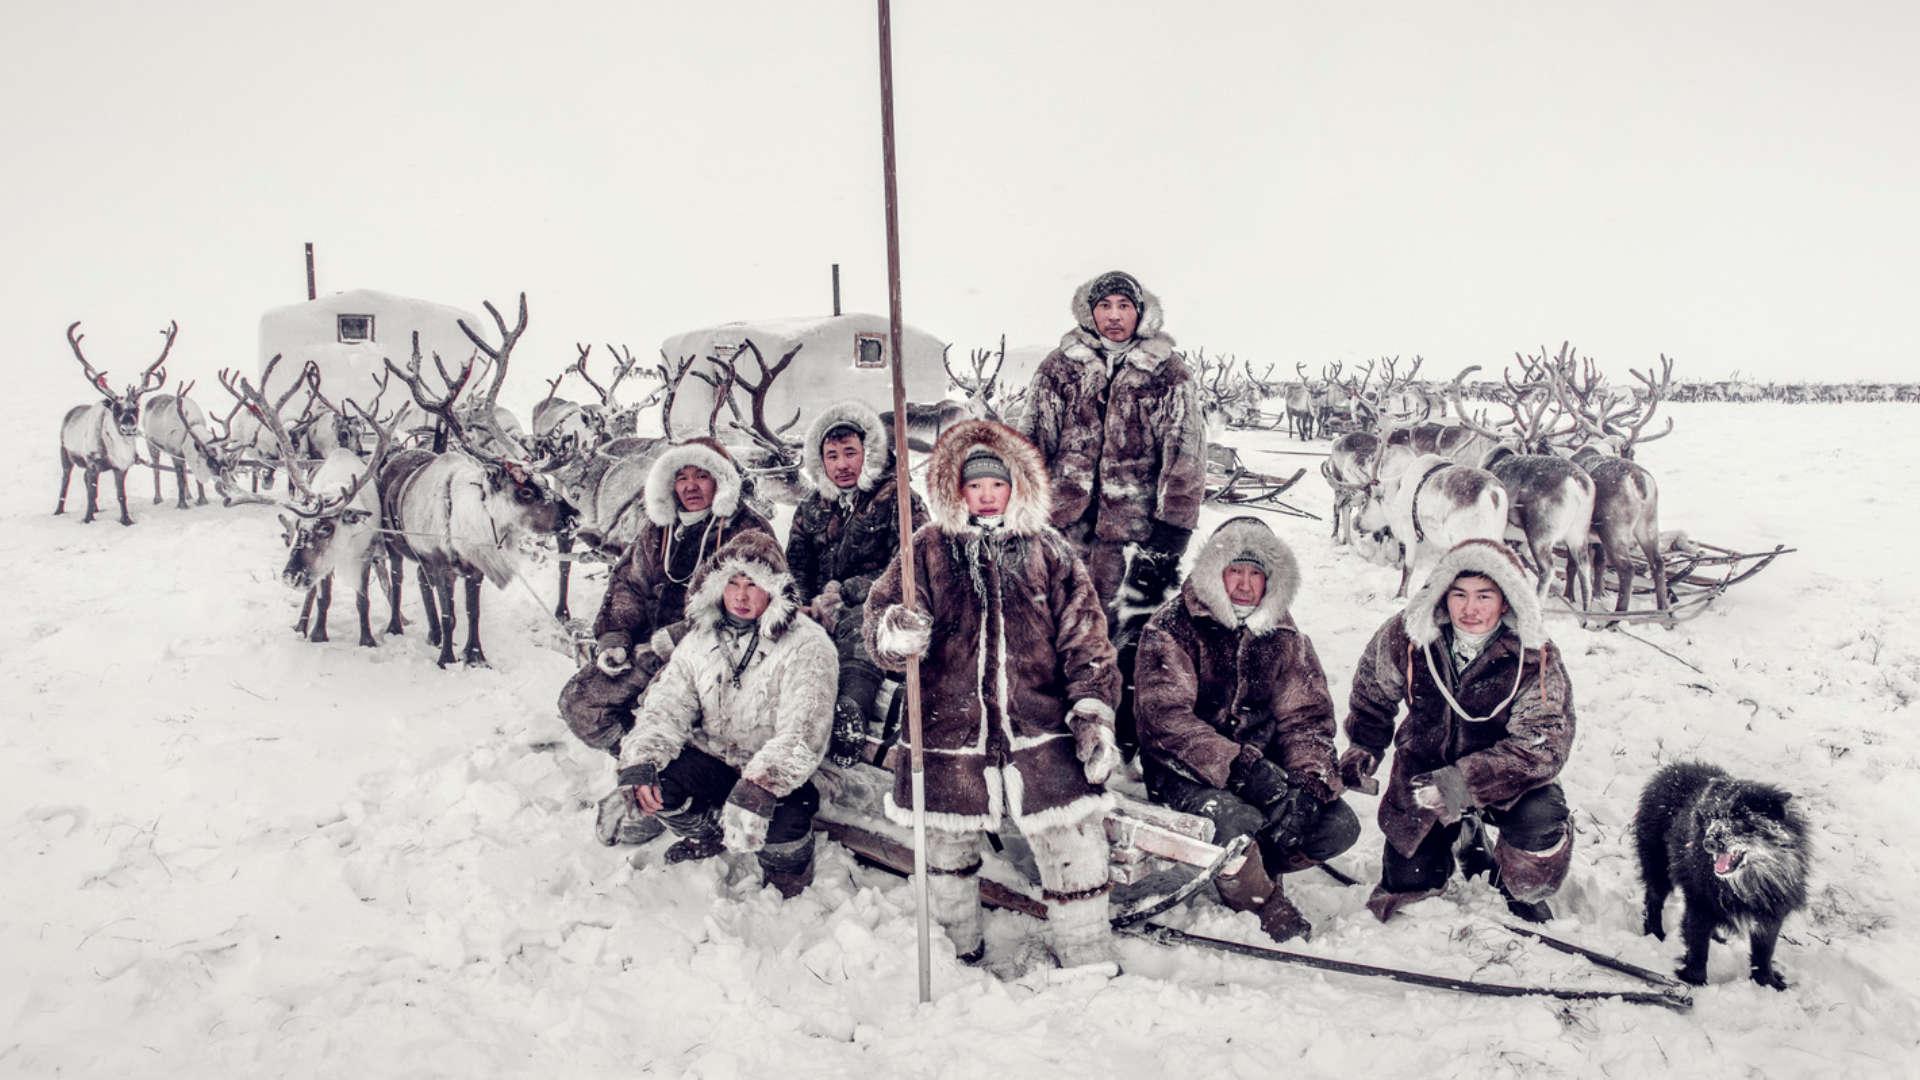 Dolgan stam, Yakutia, Siberië